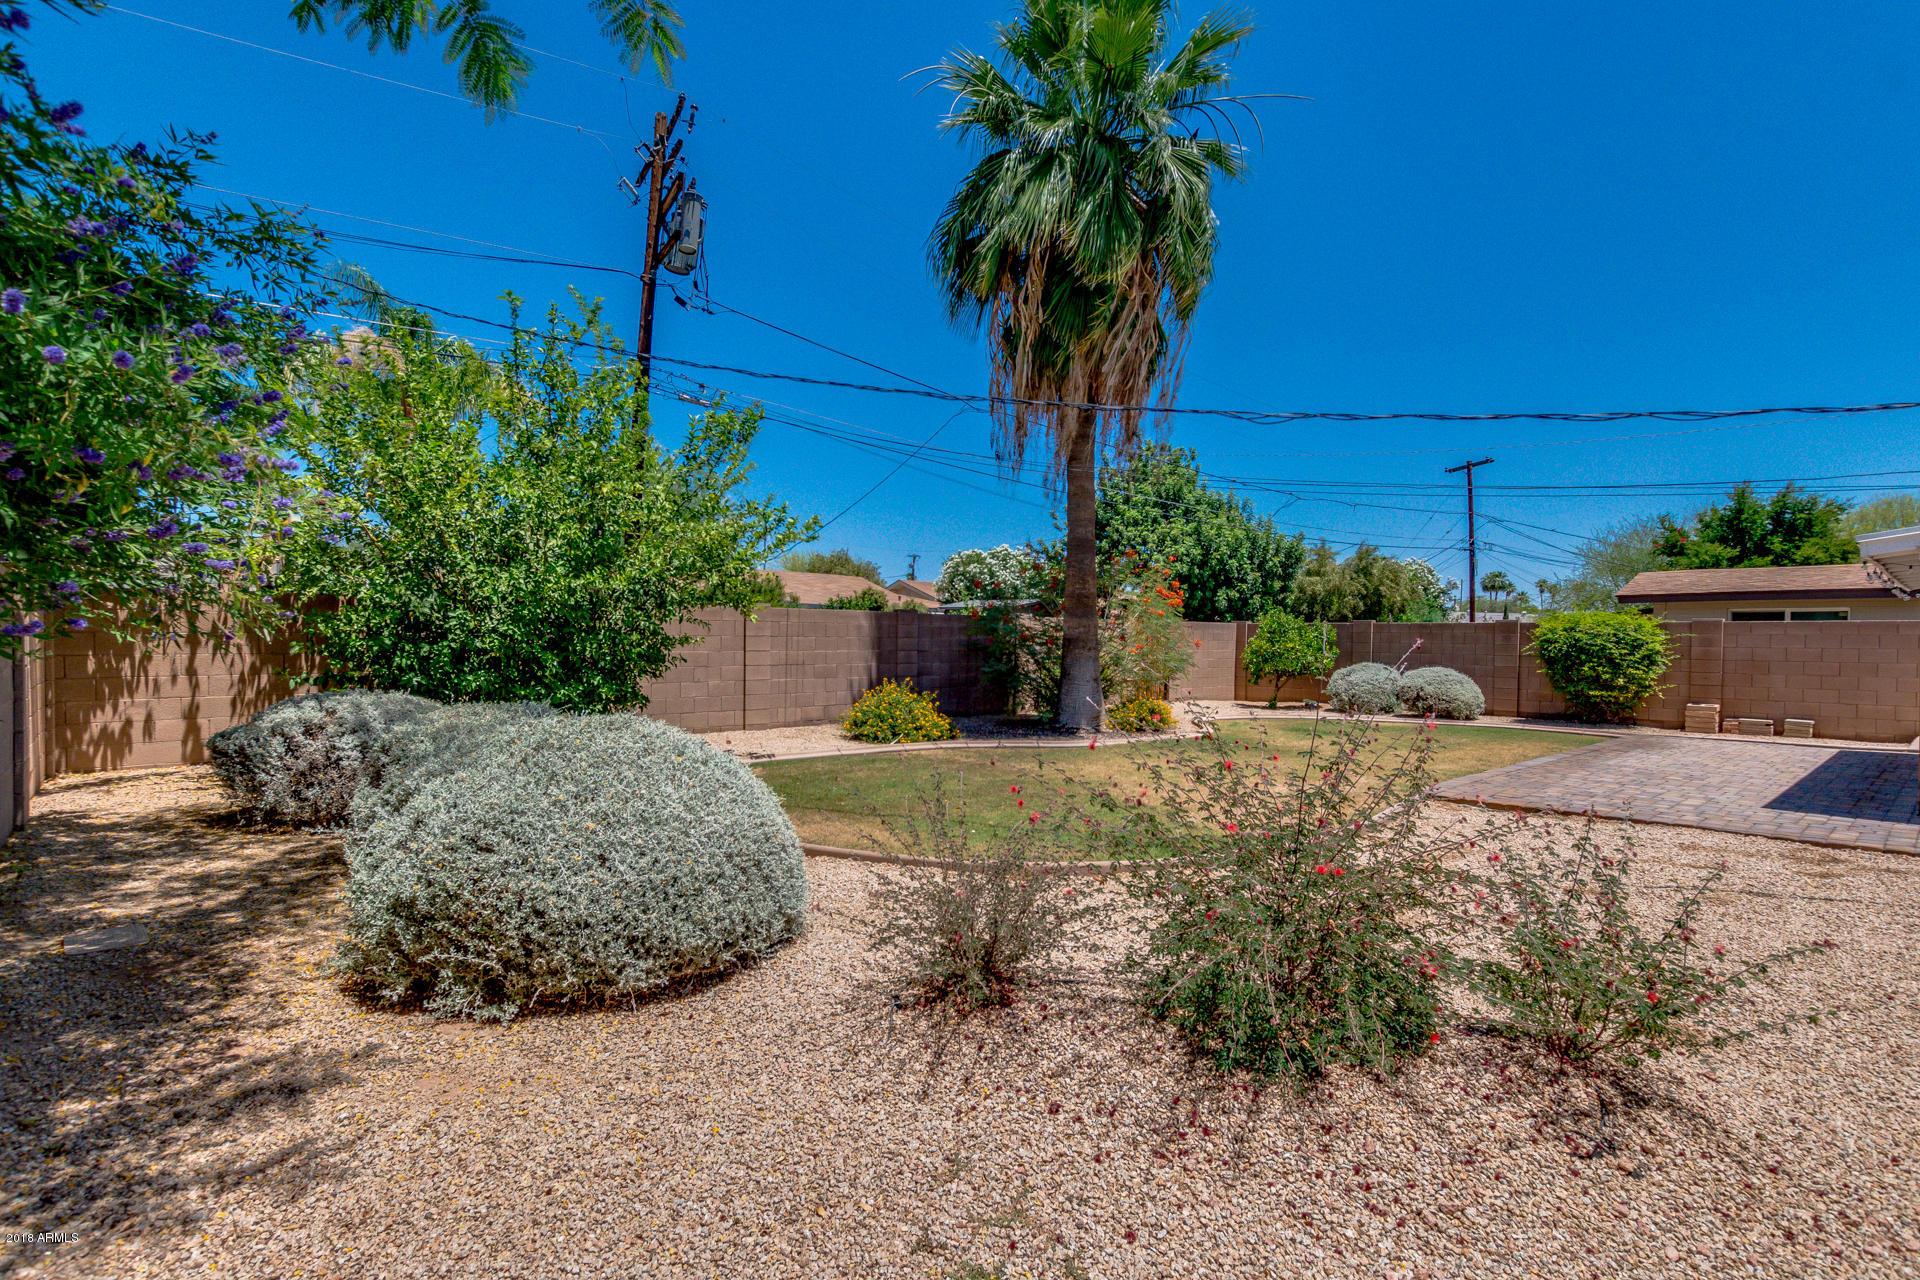 7514 E HAZELWOOD Street, Scottsdale, Arizona 85251, 2 Bedrooms Bedrooms, ,Residential Lease,For Rent,7514 E HAZELWOOD Street,6018964